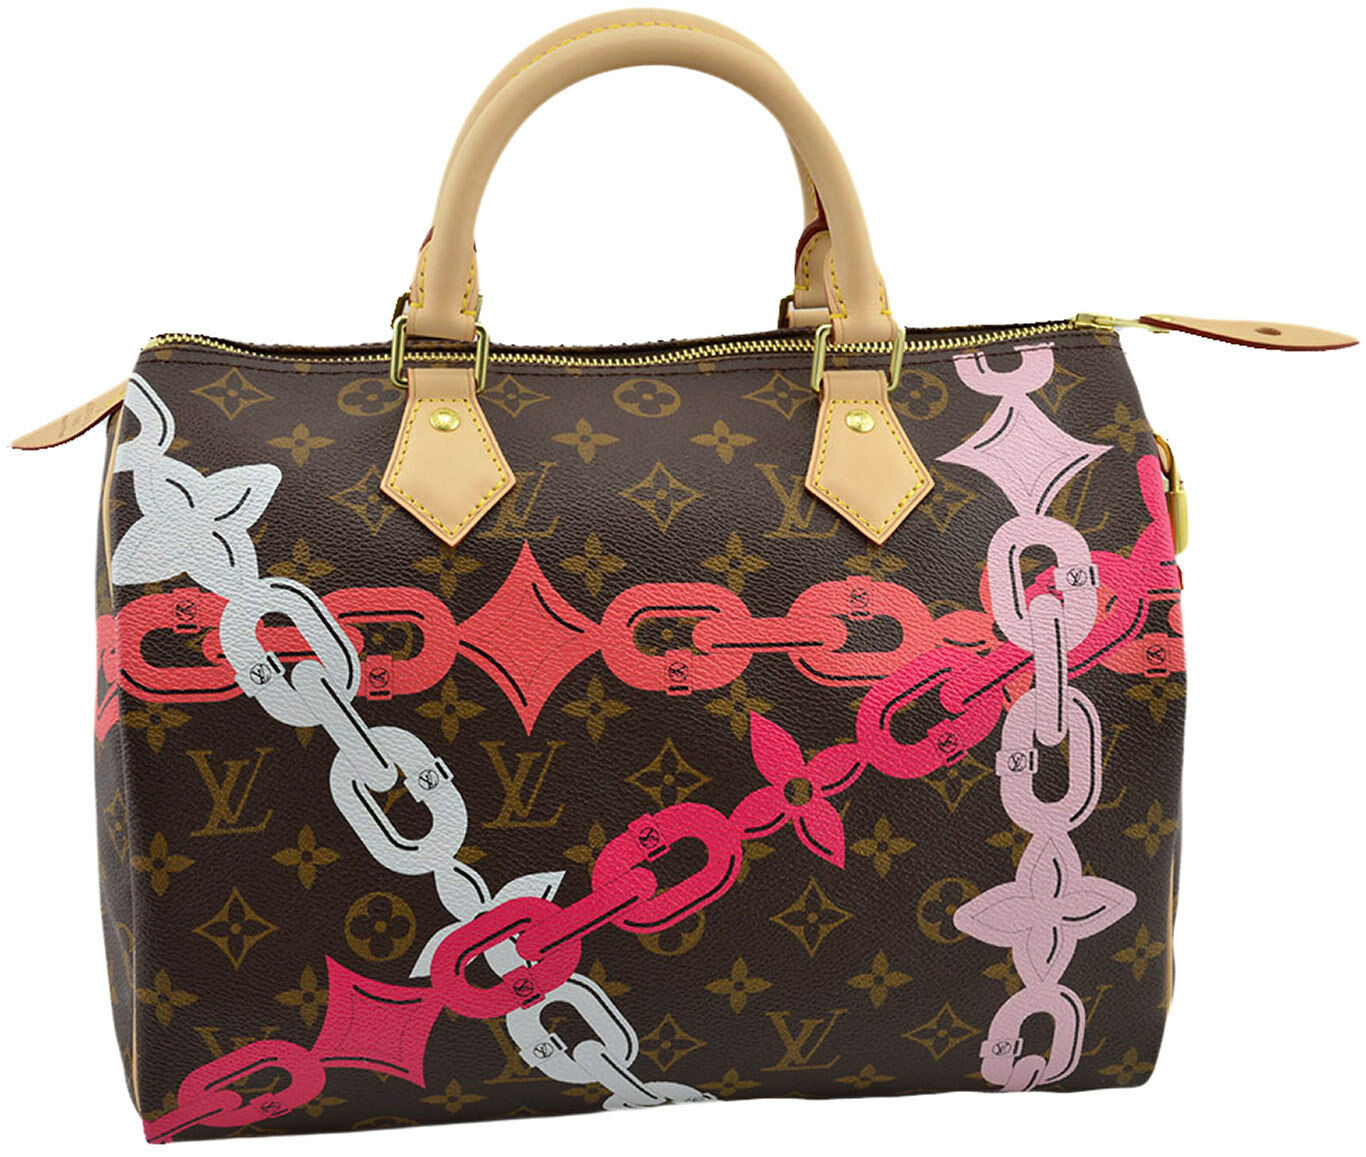 812f6f67e19 Details about LOUIS VUITTON Speedy 30 MONOGRAM BAY Shopper Tote Bag LIMITED  EDITION